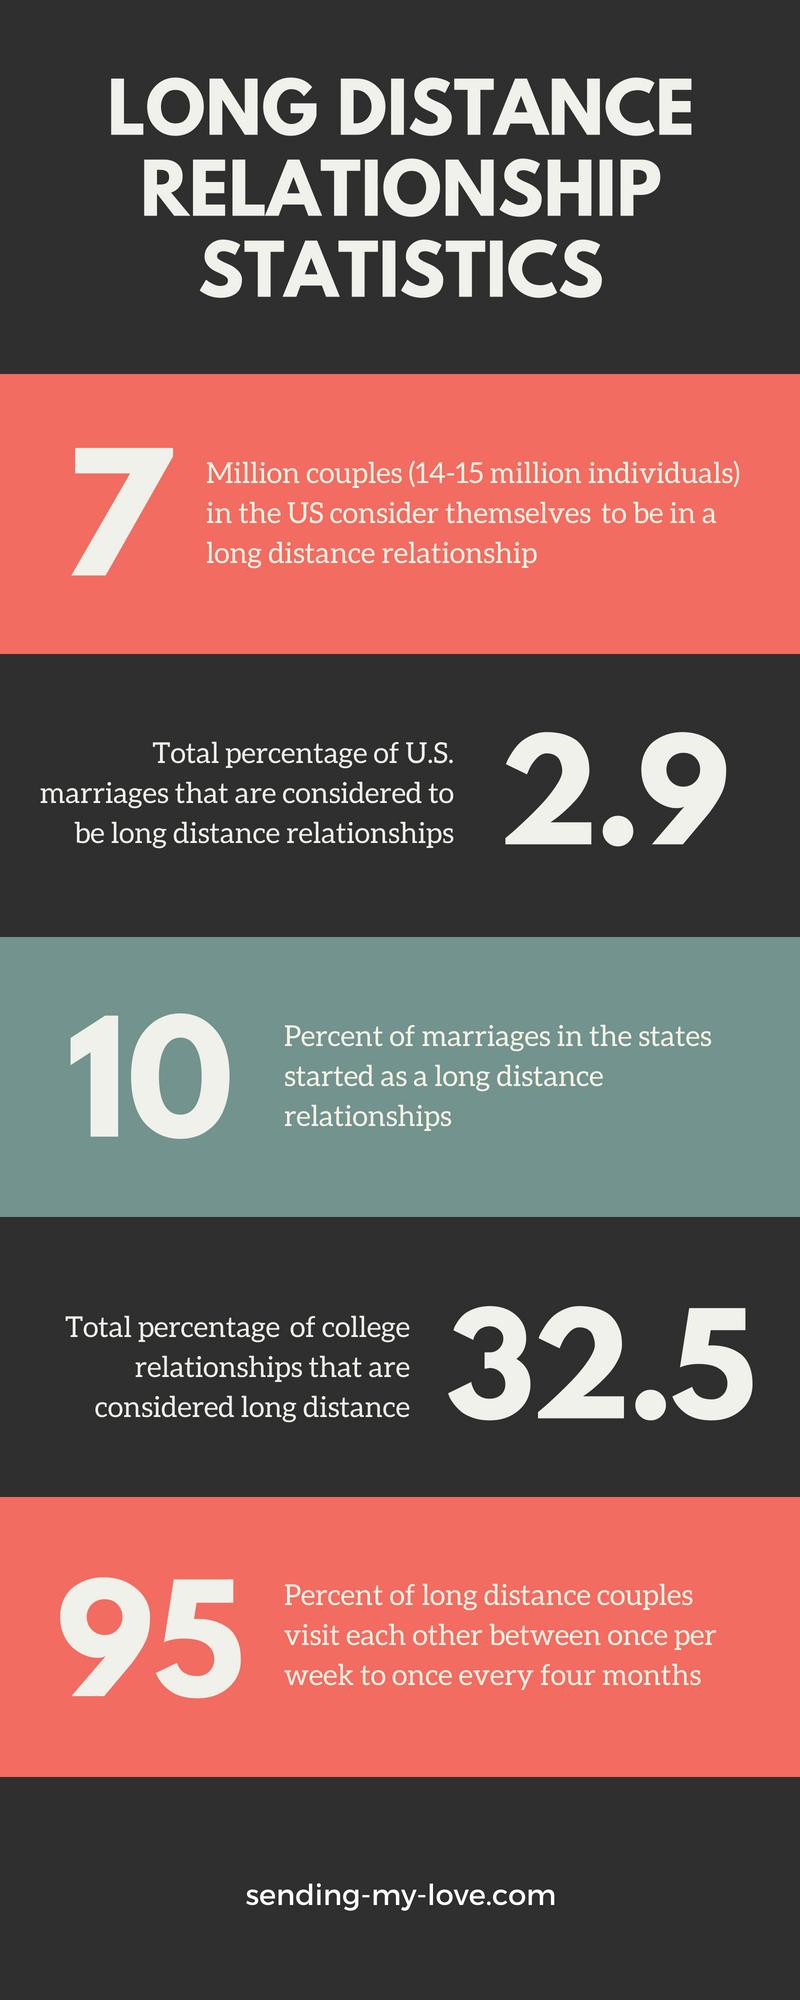 Long distance relationship statistics